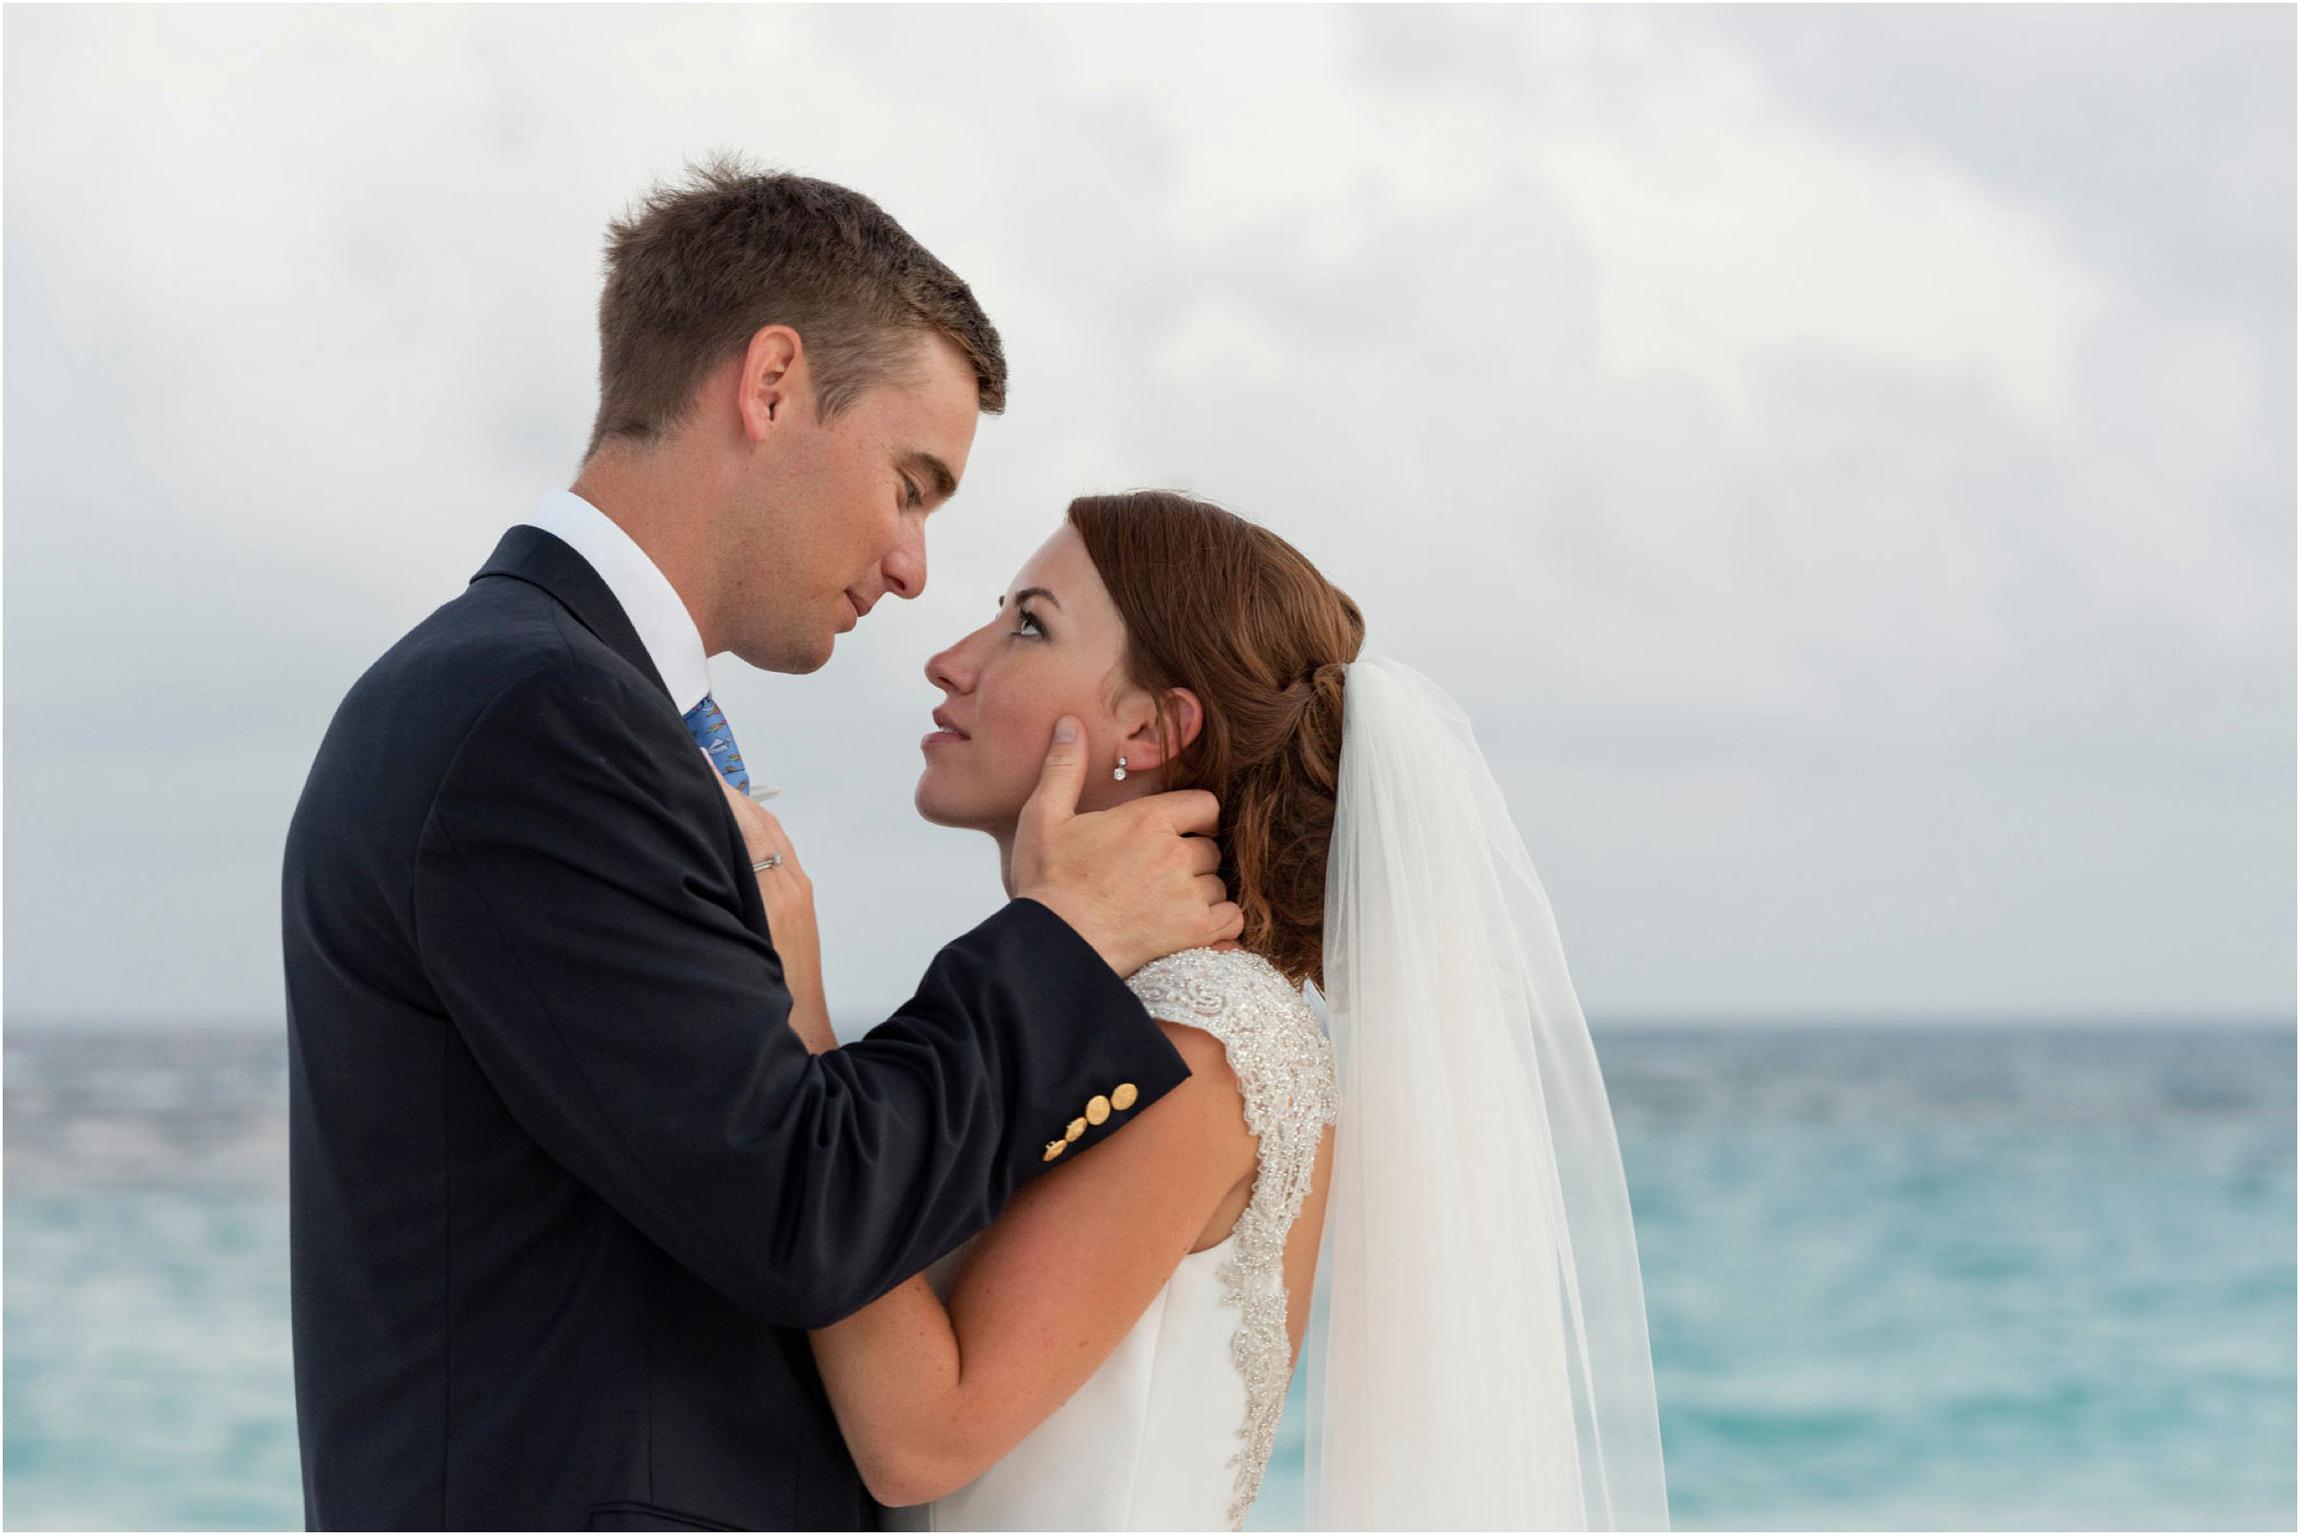 ©FianderFoto_Bermuda Wedding Photographer_Mid Ocean_Rachel_Angus_074.jpg